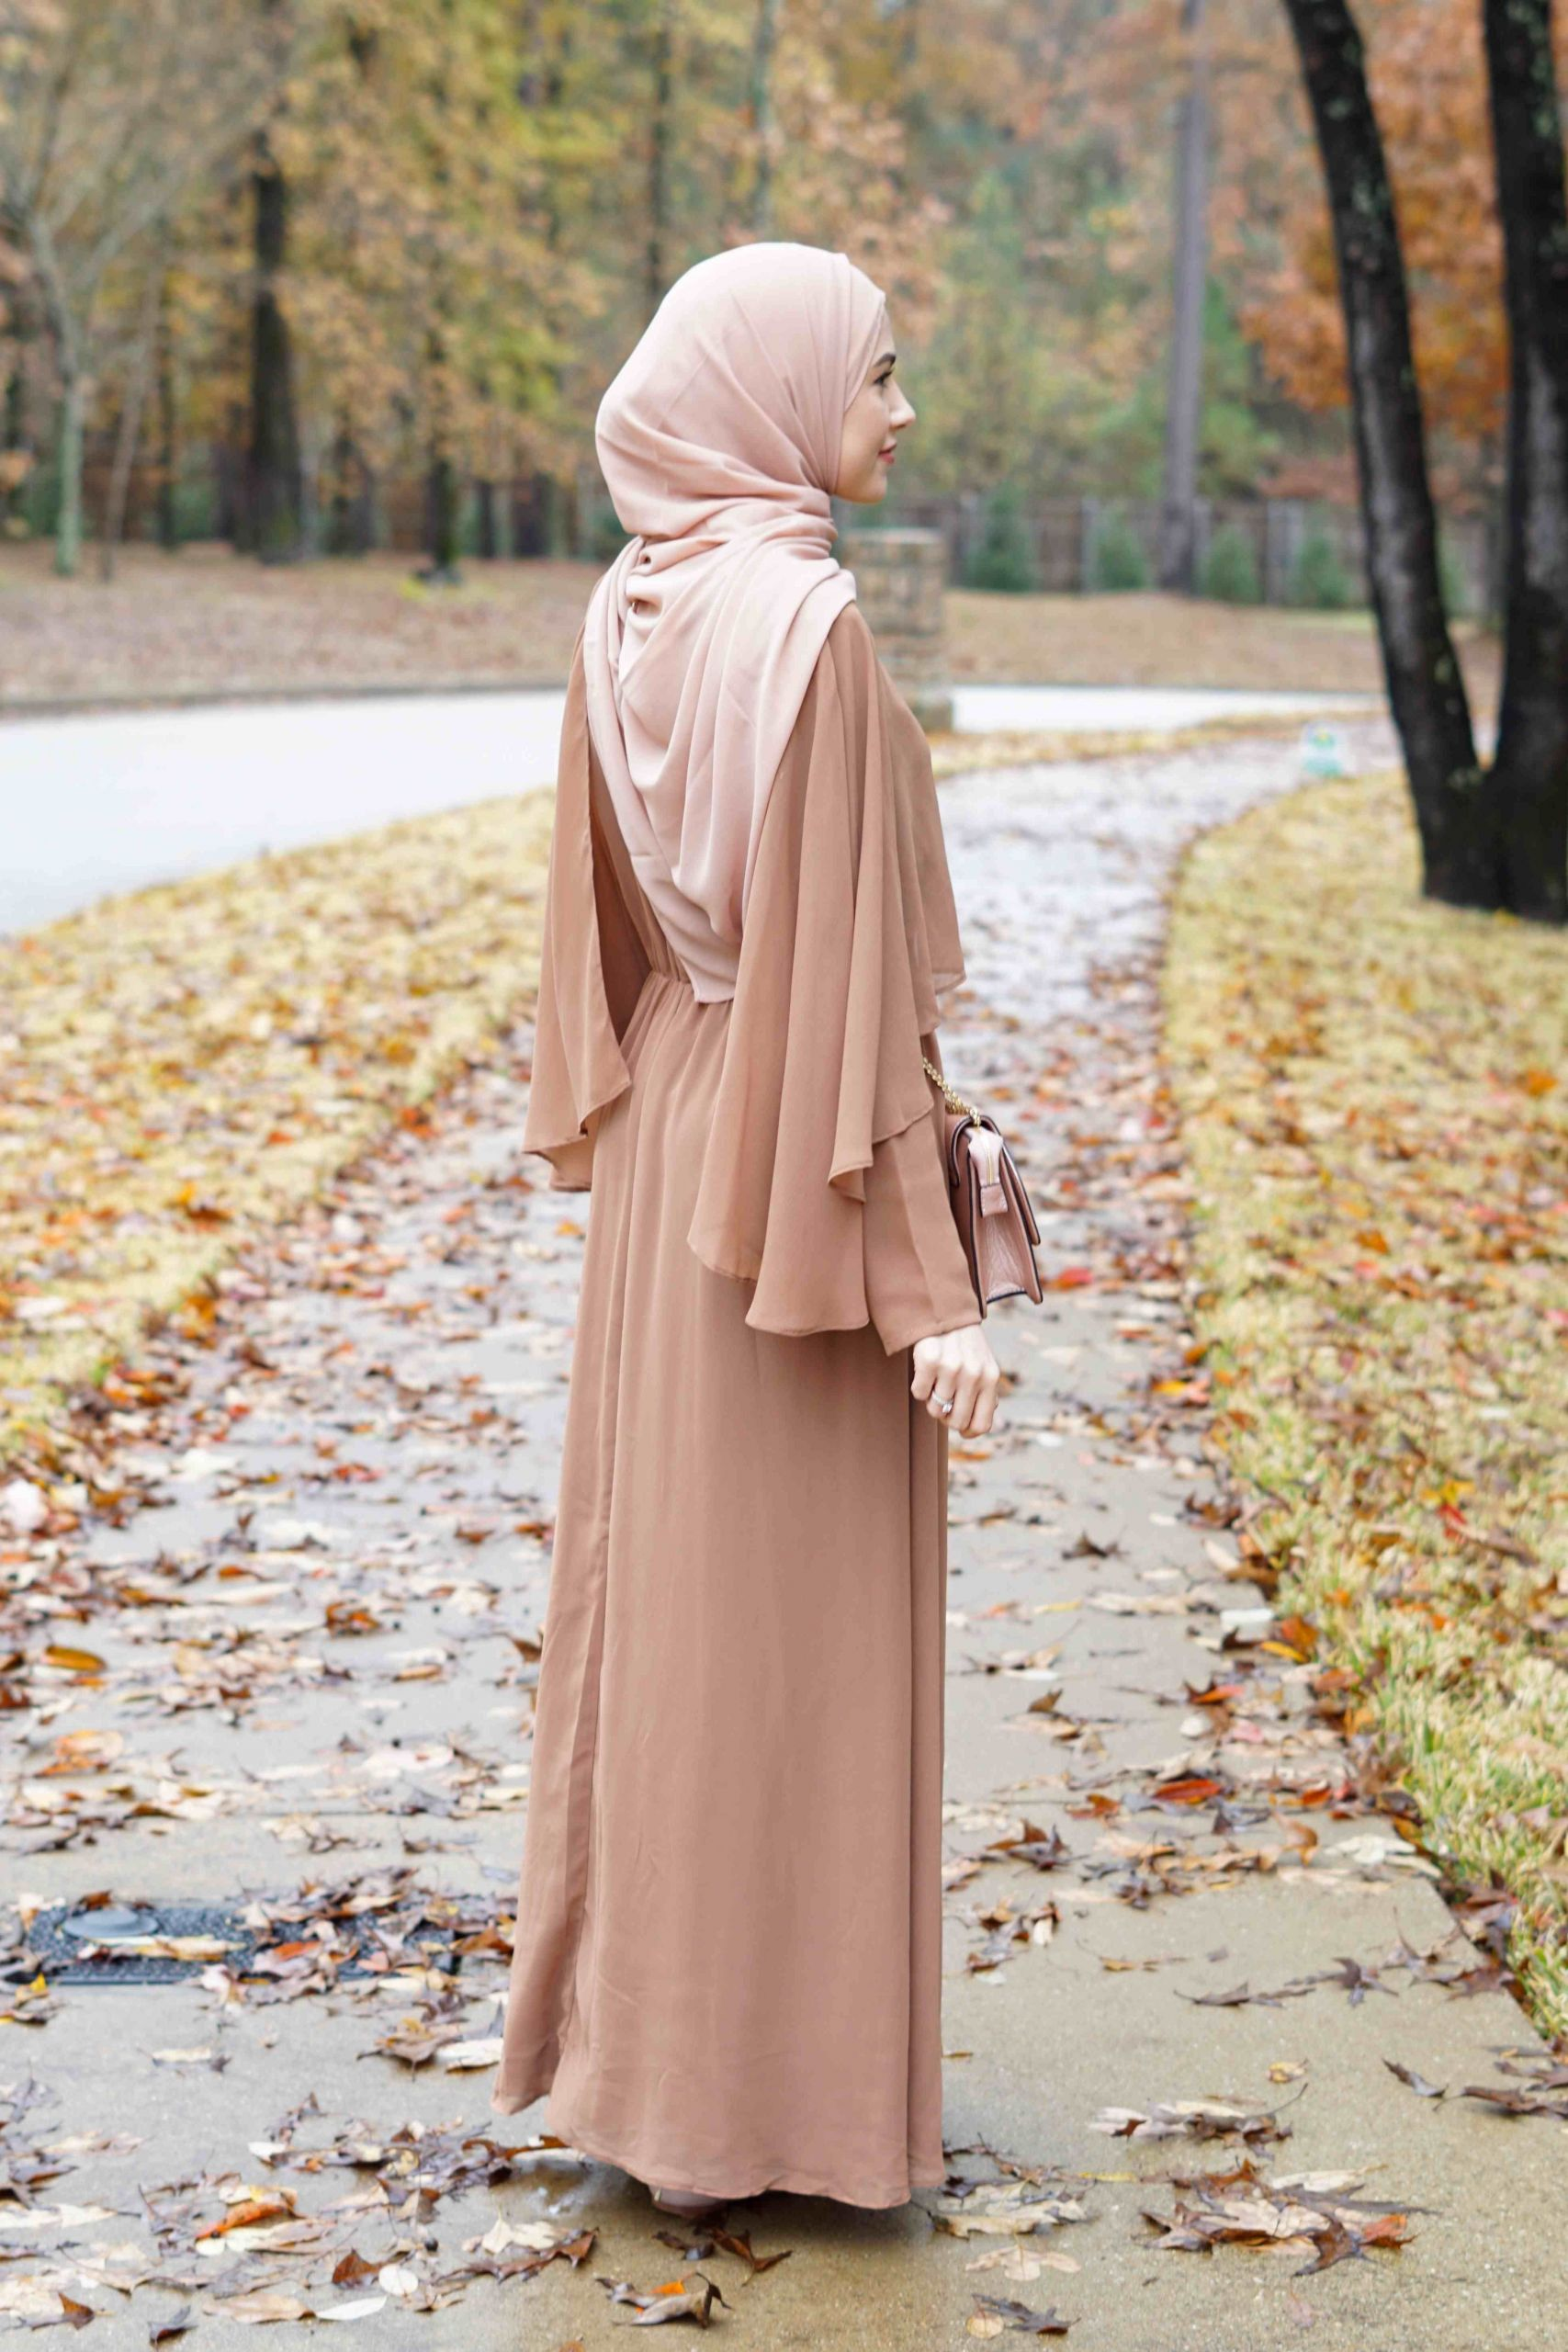 Model Fashion Muslimah Casual 9fdy ριитєяєѕт Inxspiration